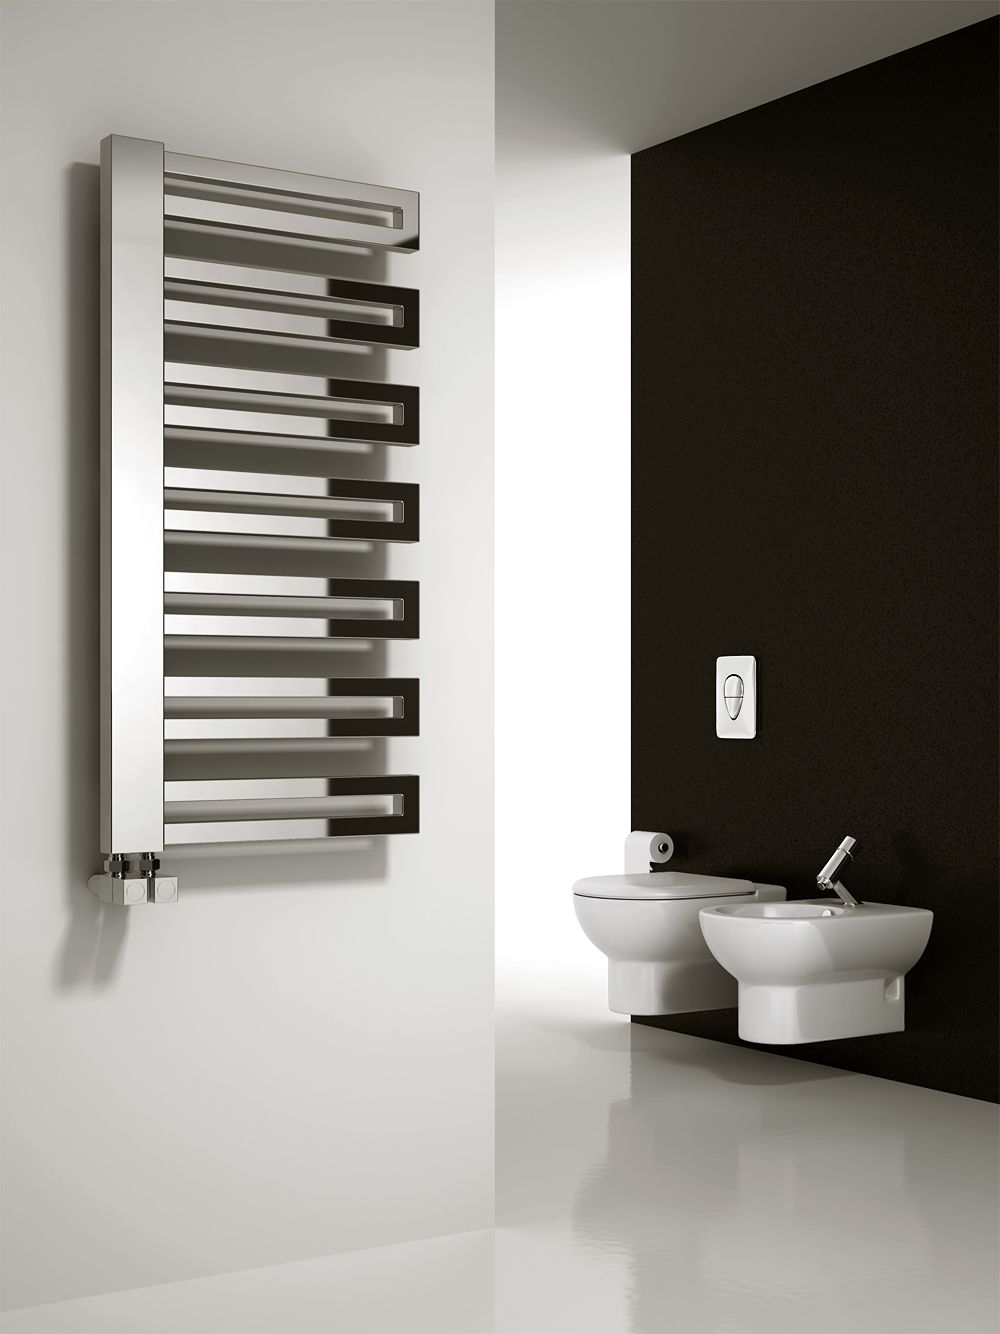 Electric bathroom towel radiators - Reina Ginosa Towel Radiator Modern Towel Radiators